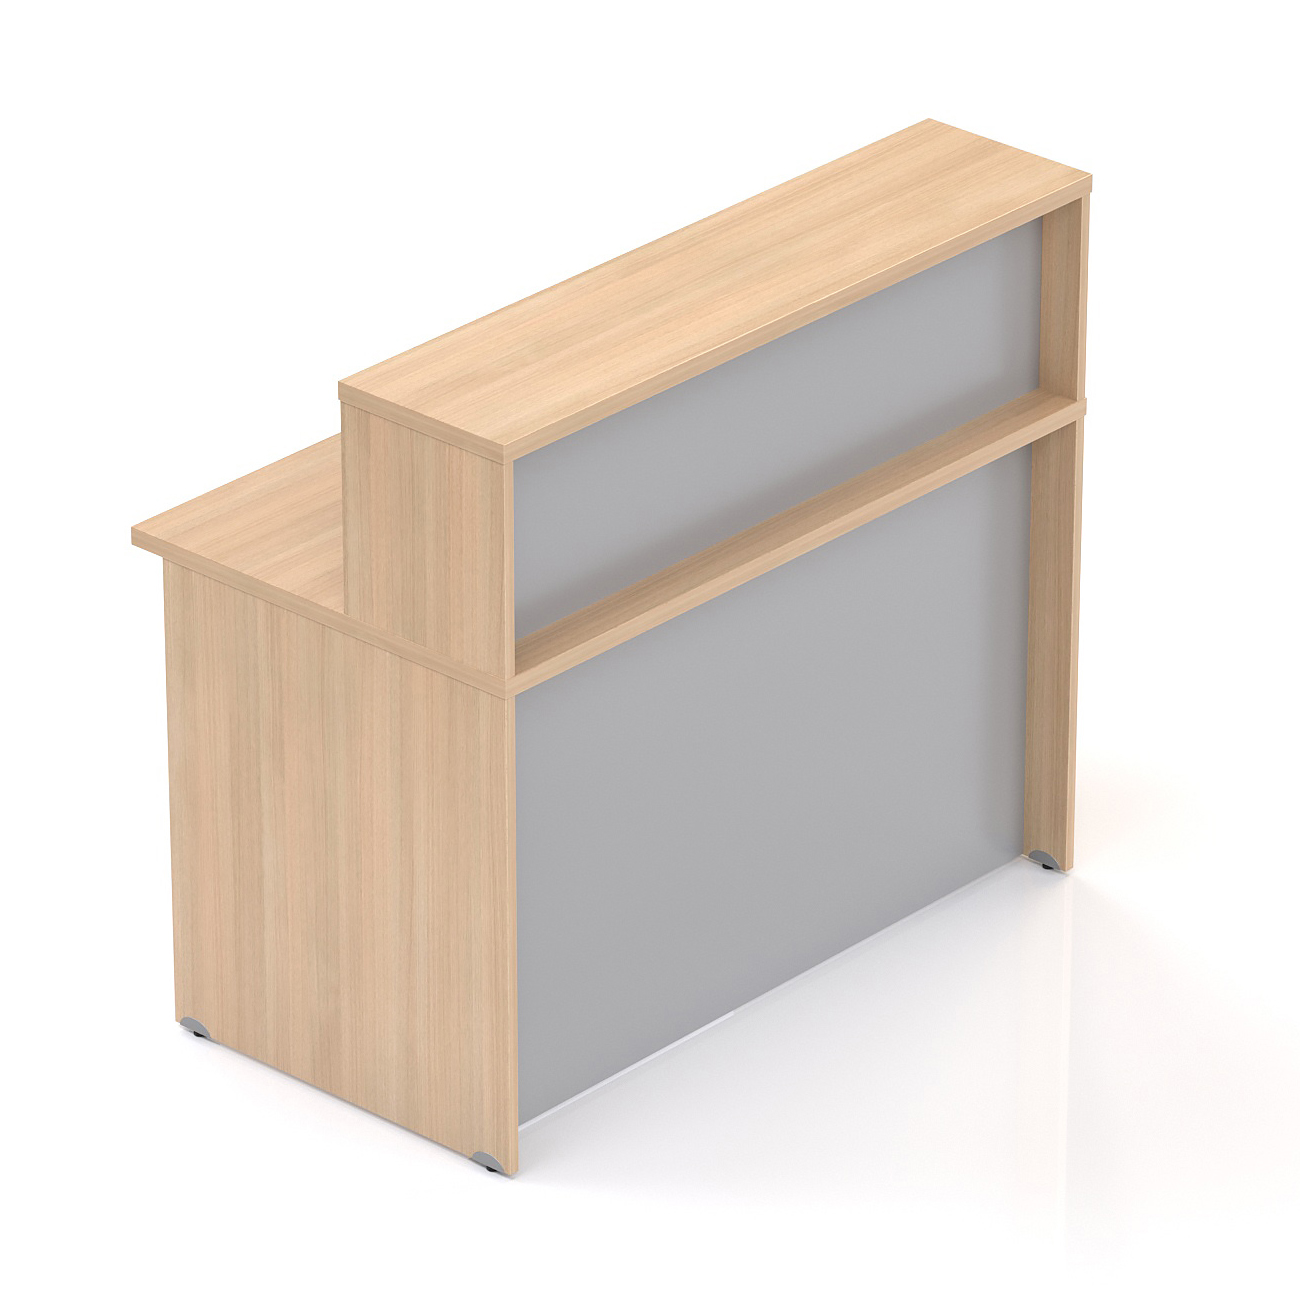 Recepčný pult s nadstavbou Komfort, 136x70x111 cm - NLKA13 05